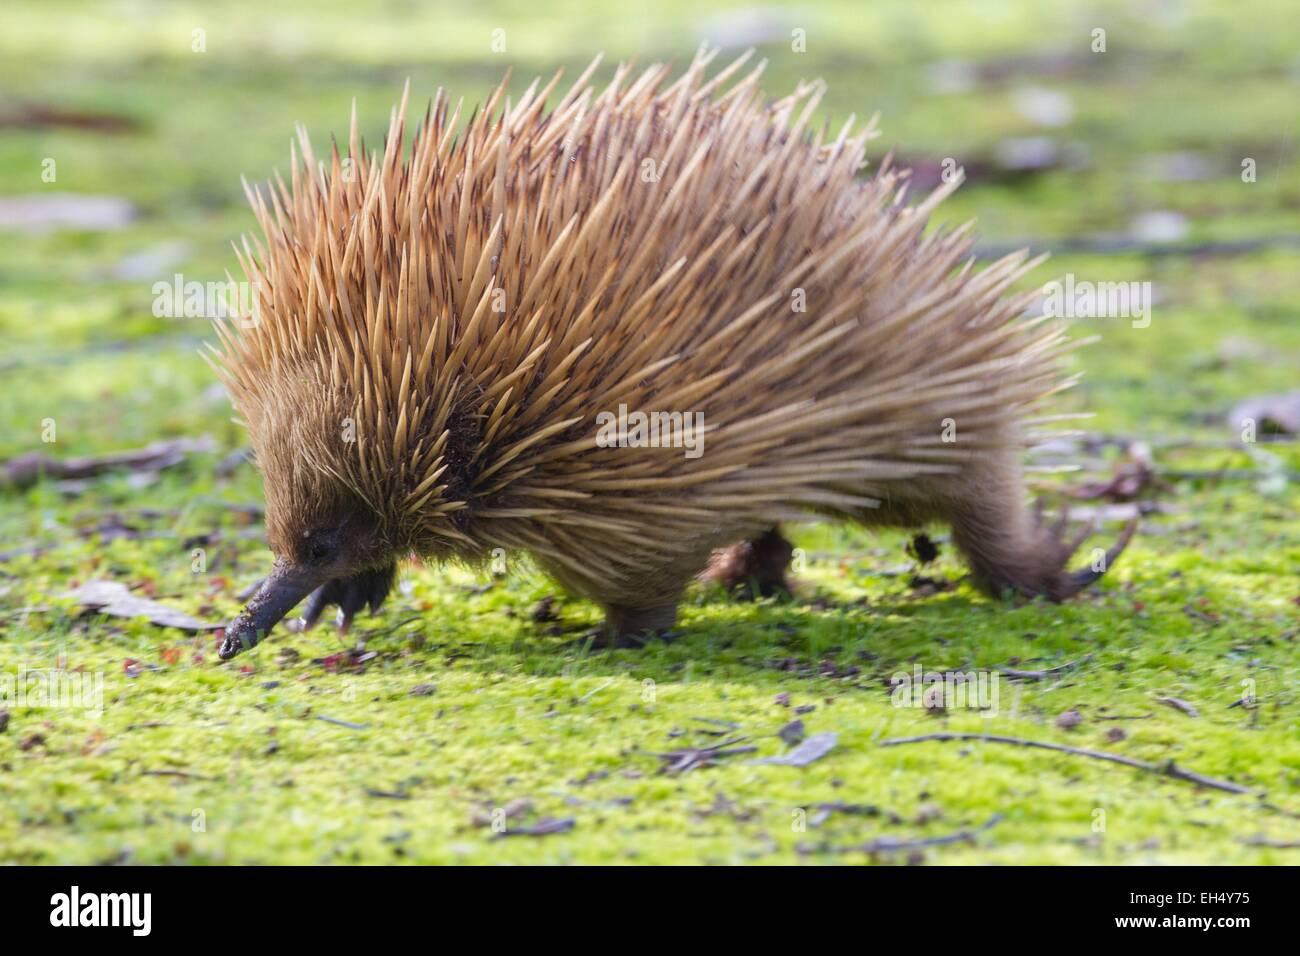 Australia, South Australia, Kangaroo island, Short-beaked echidna (Tachyglossus aculeatus) in a park Stock Photo